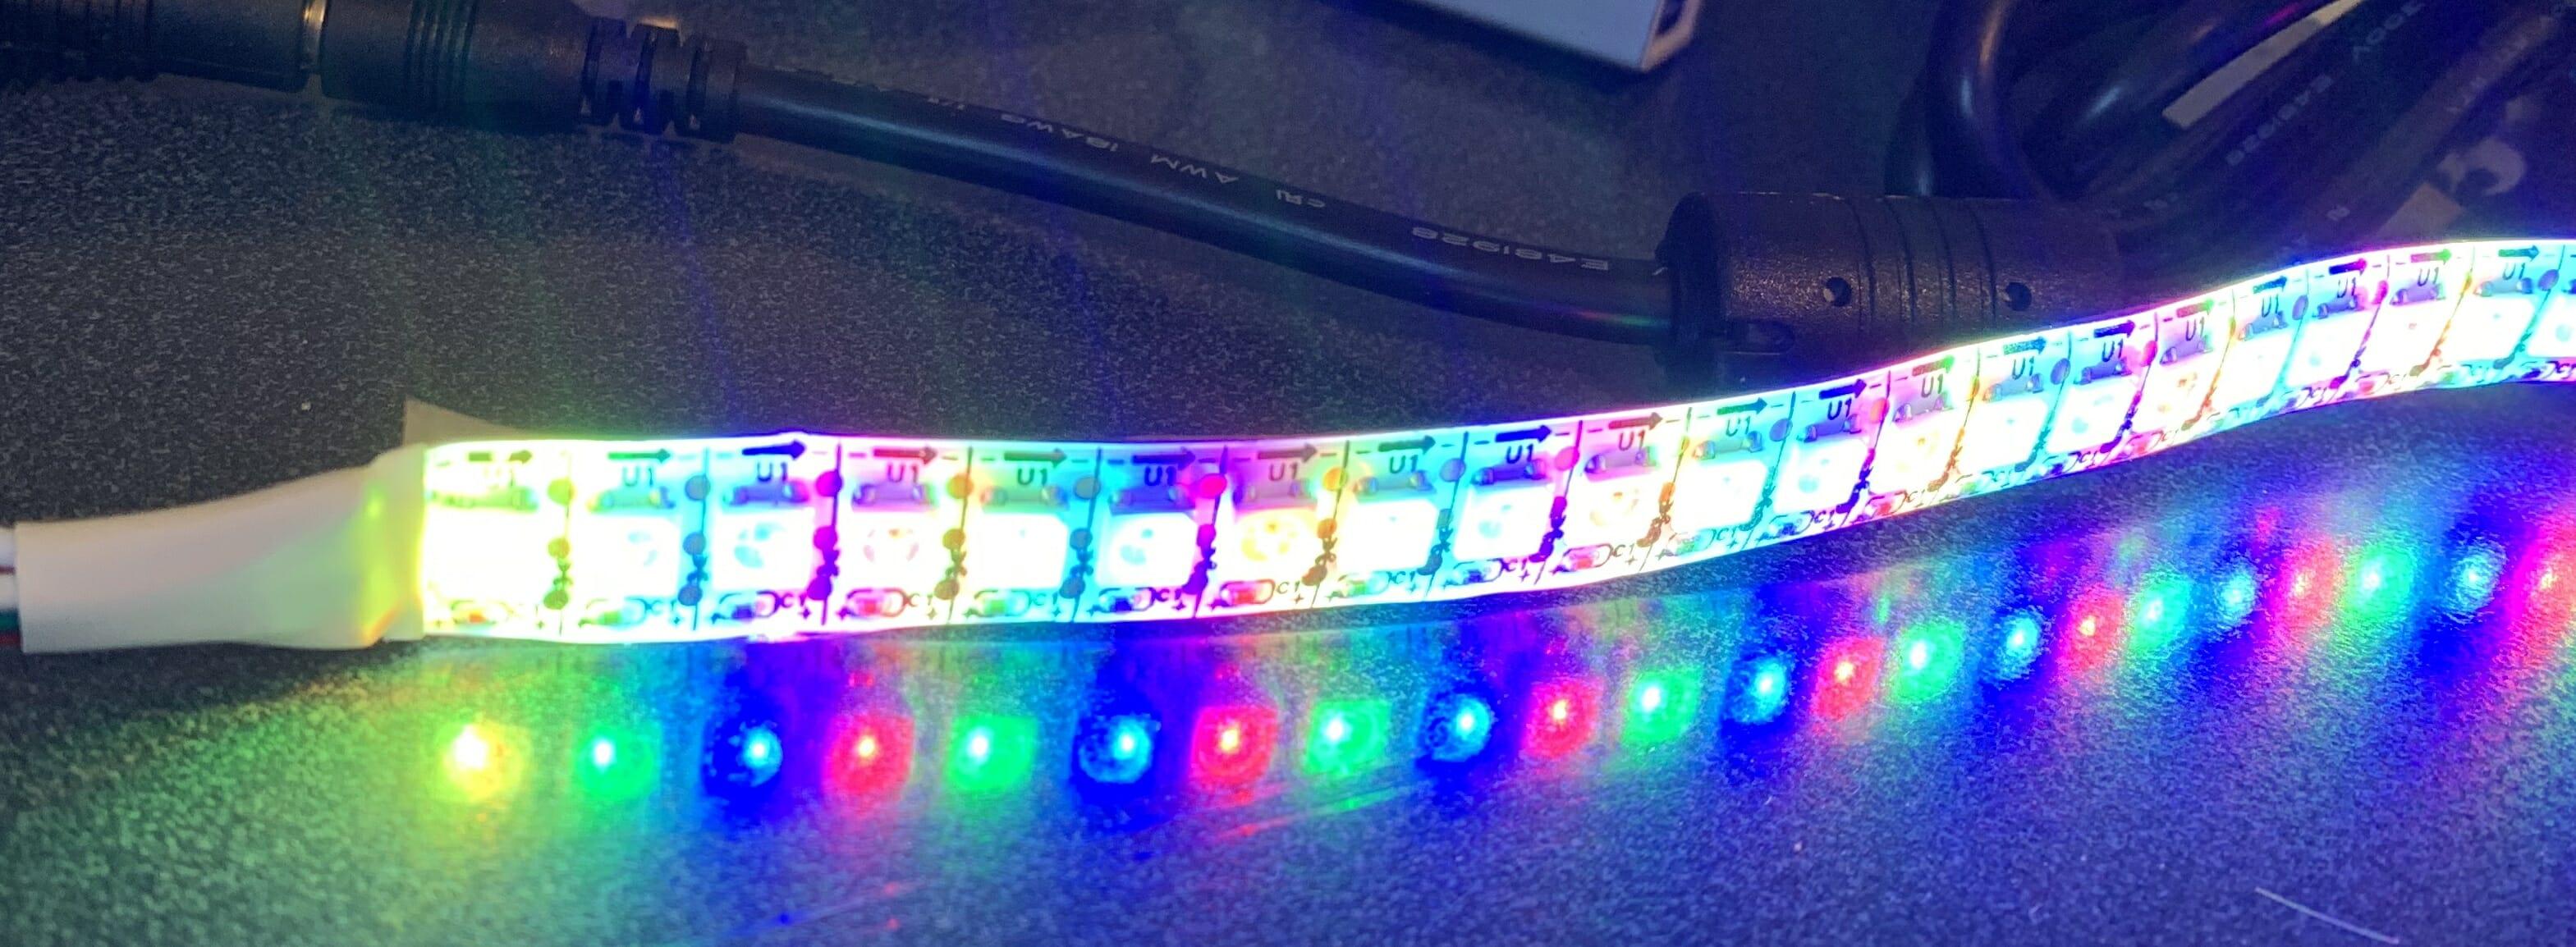 PSoC 6, DMA & WS2812 LEDs - IoT Expert